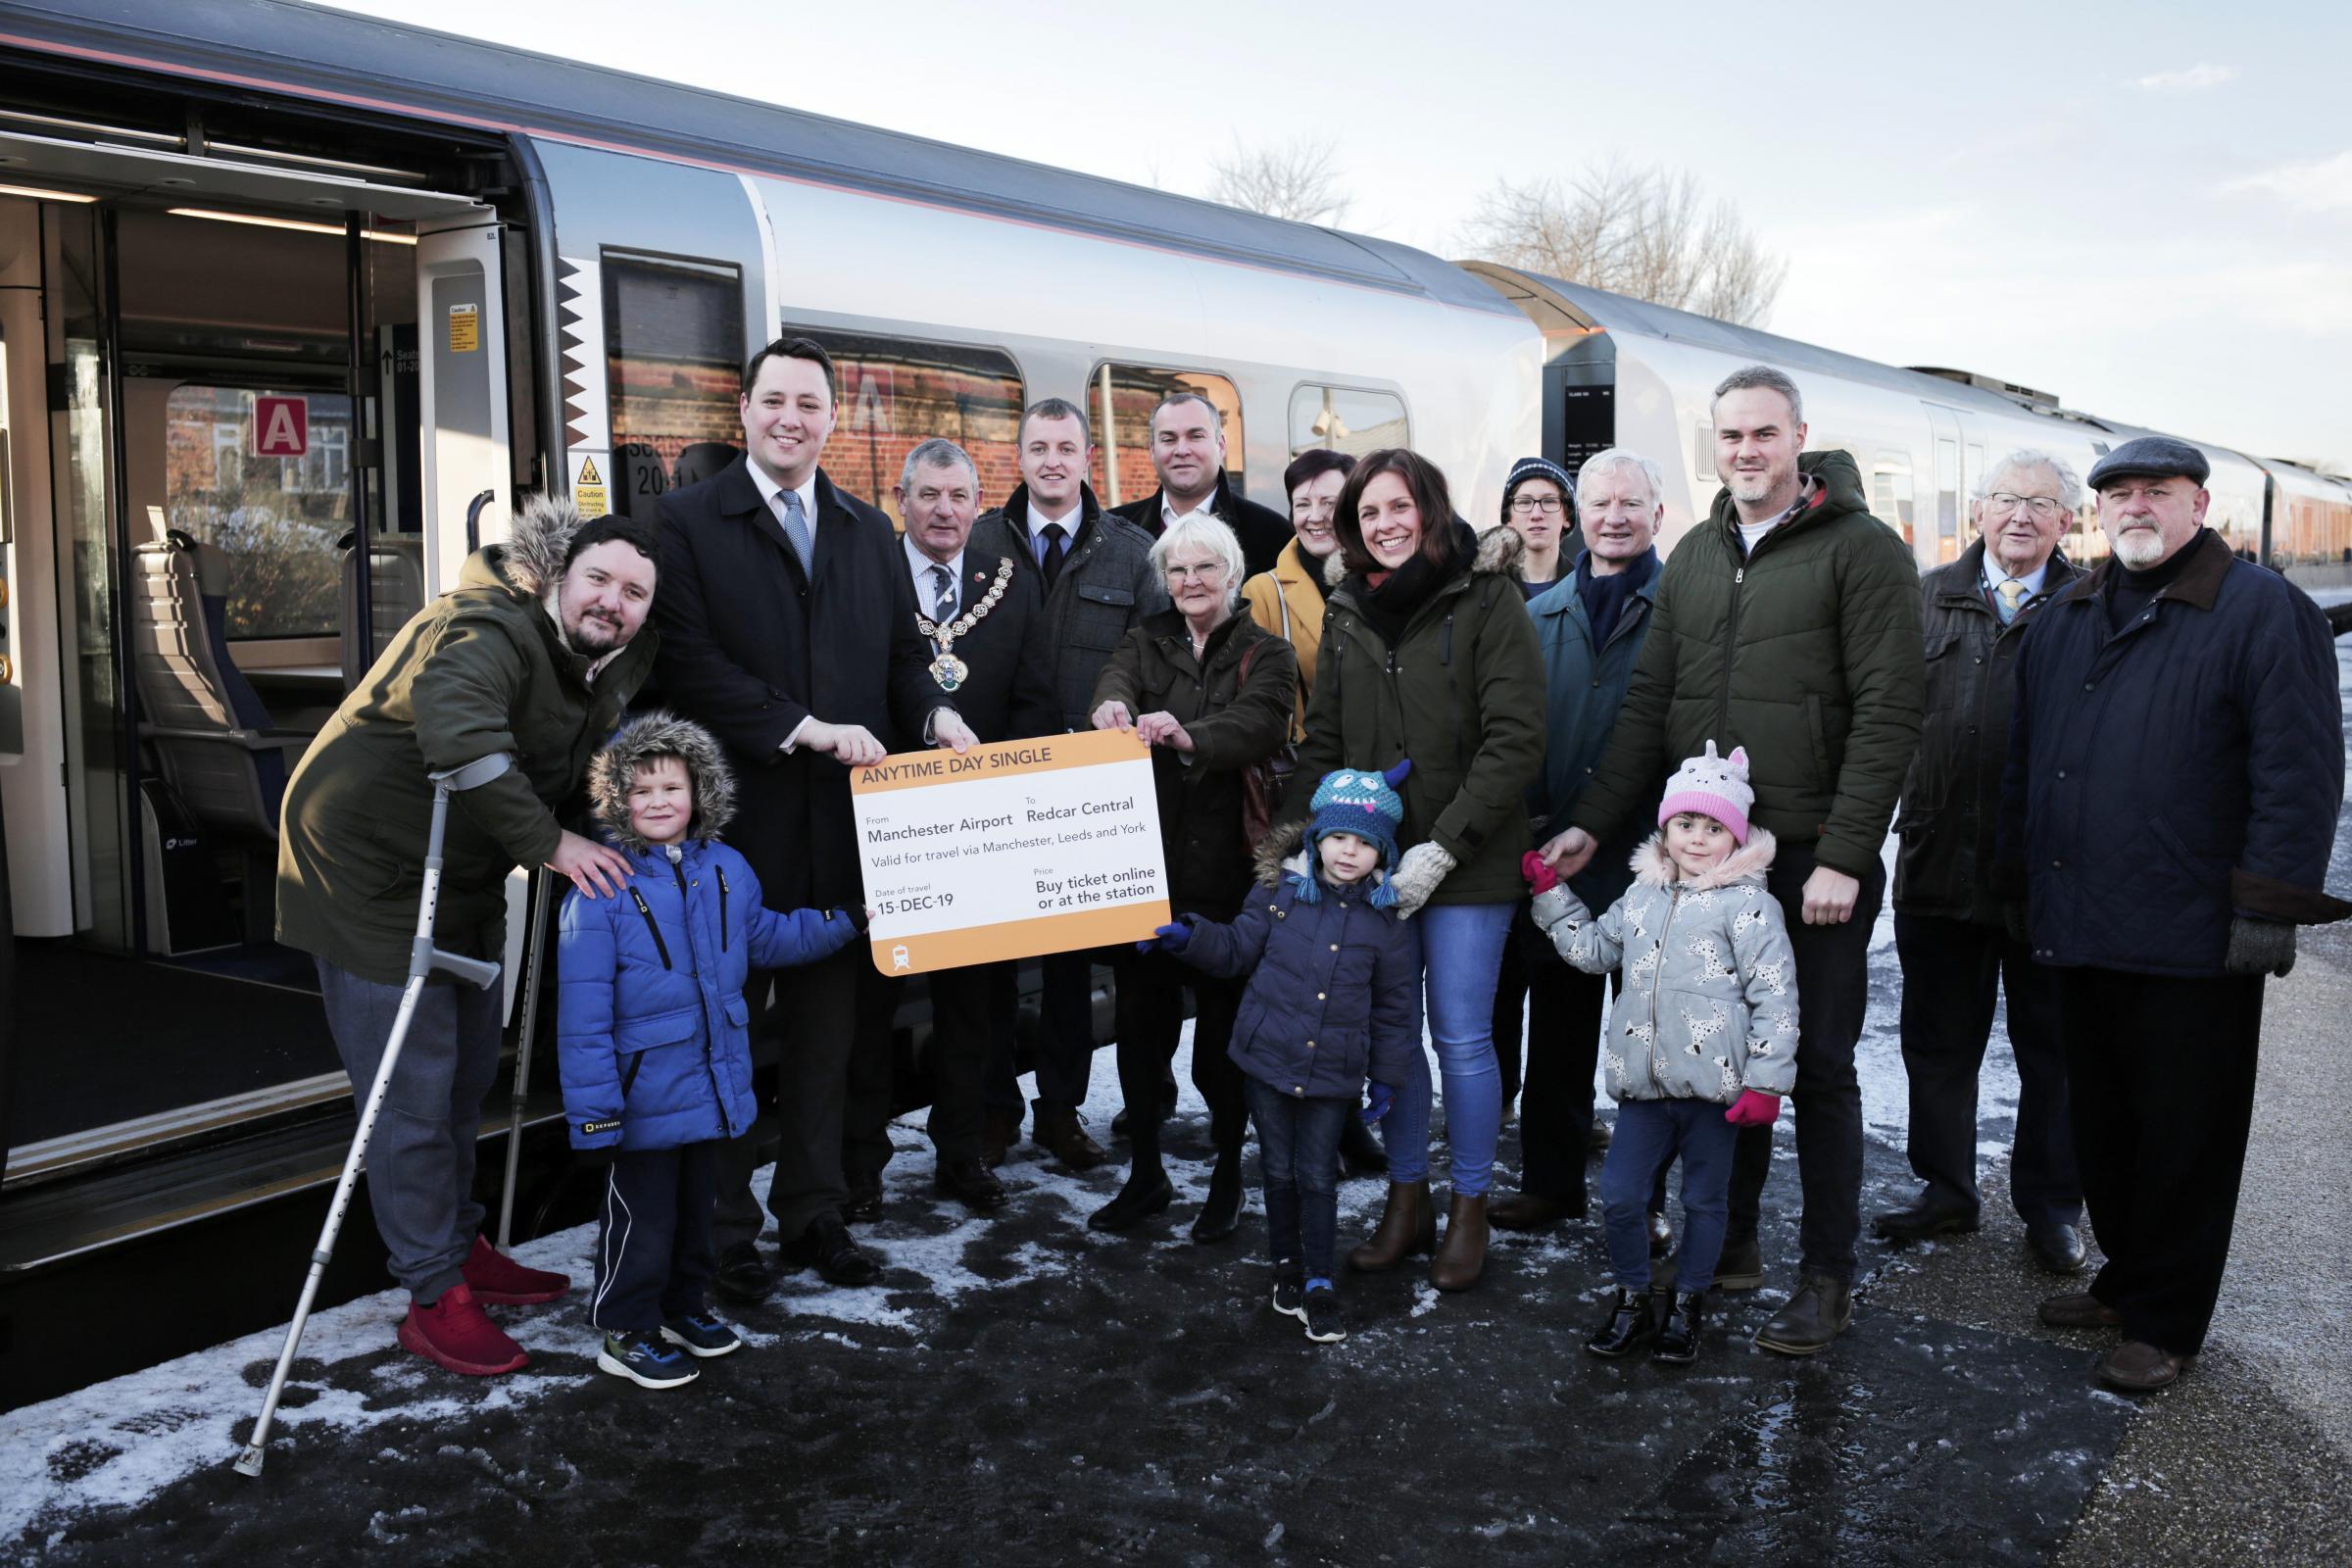 New train service pulls into Redcar